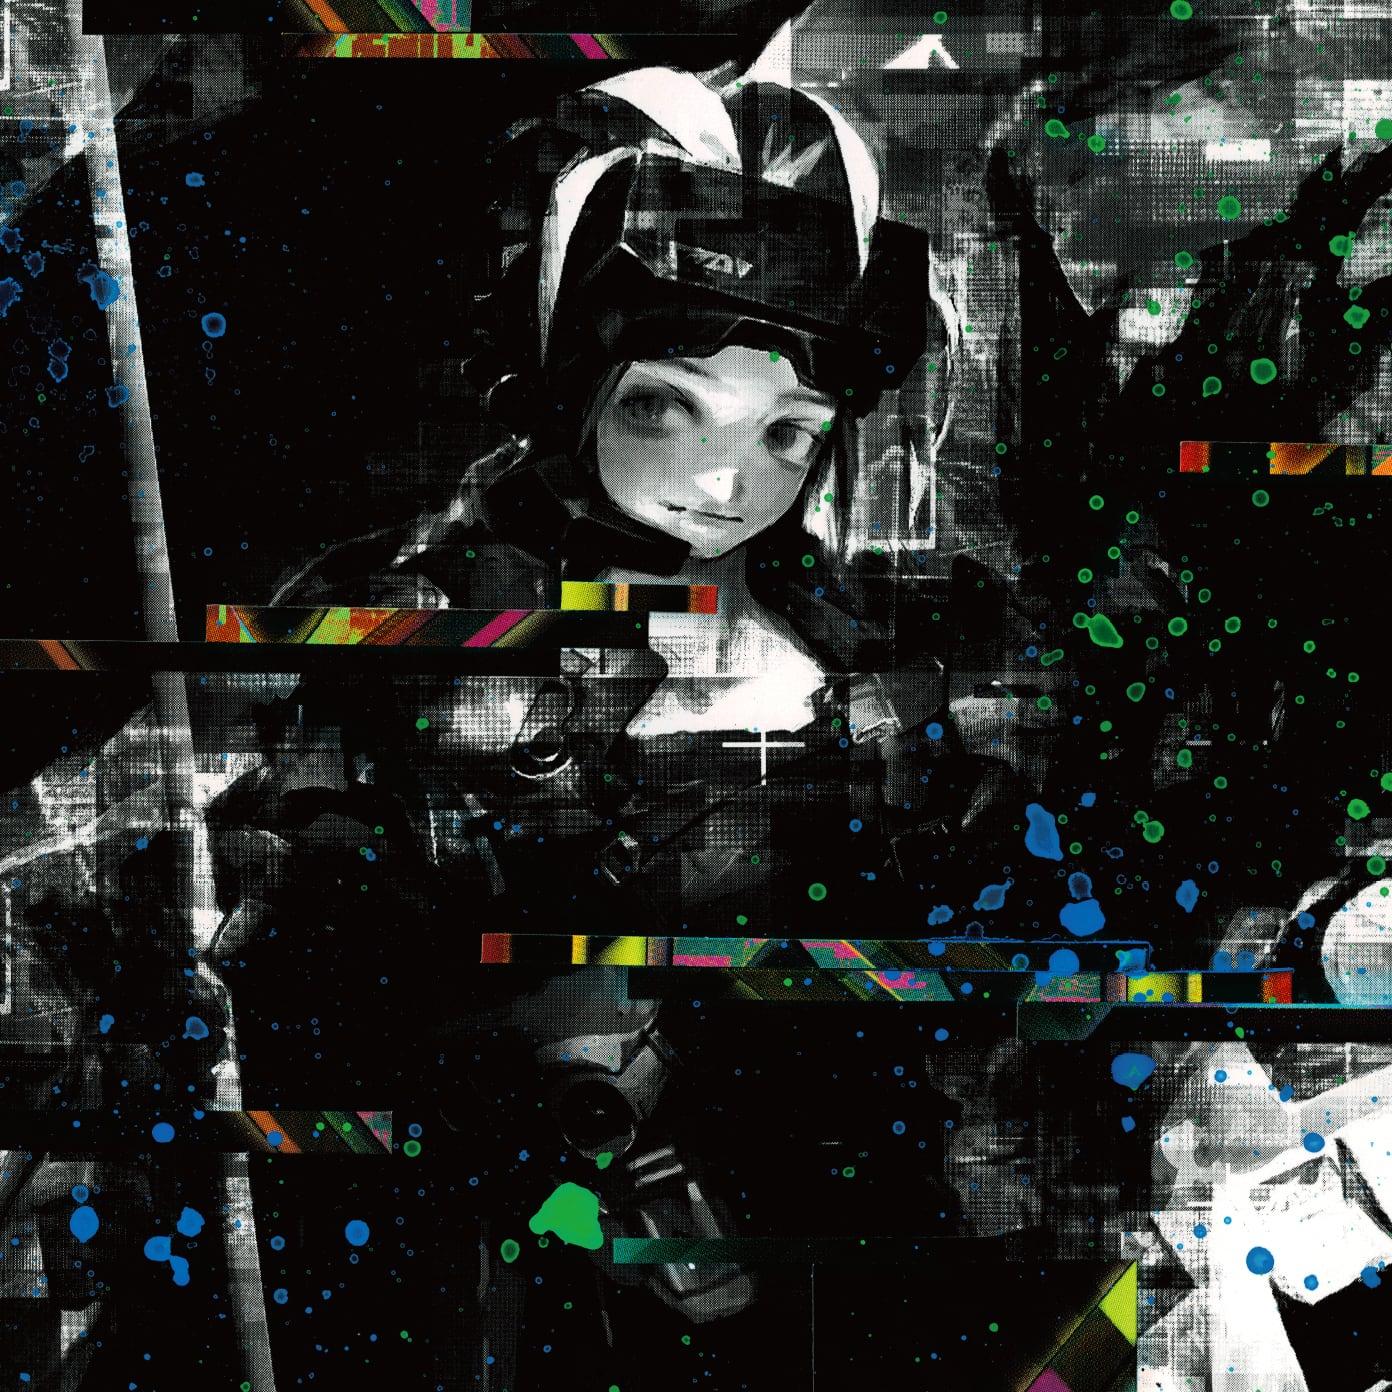 (CD) 一回性二階席 〜STRAIGHT〜 - DJ TECHNORCH [TCNCD005]